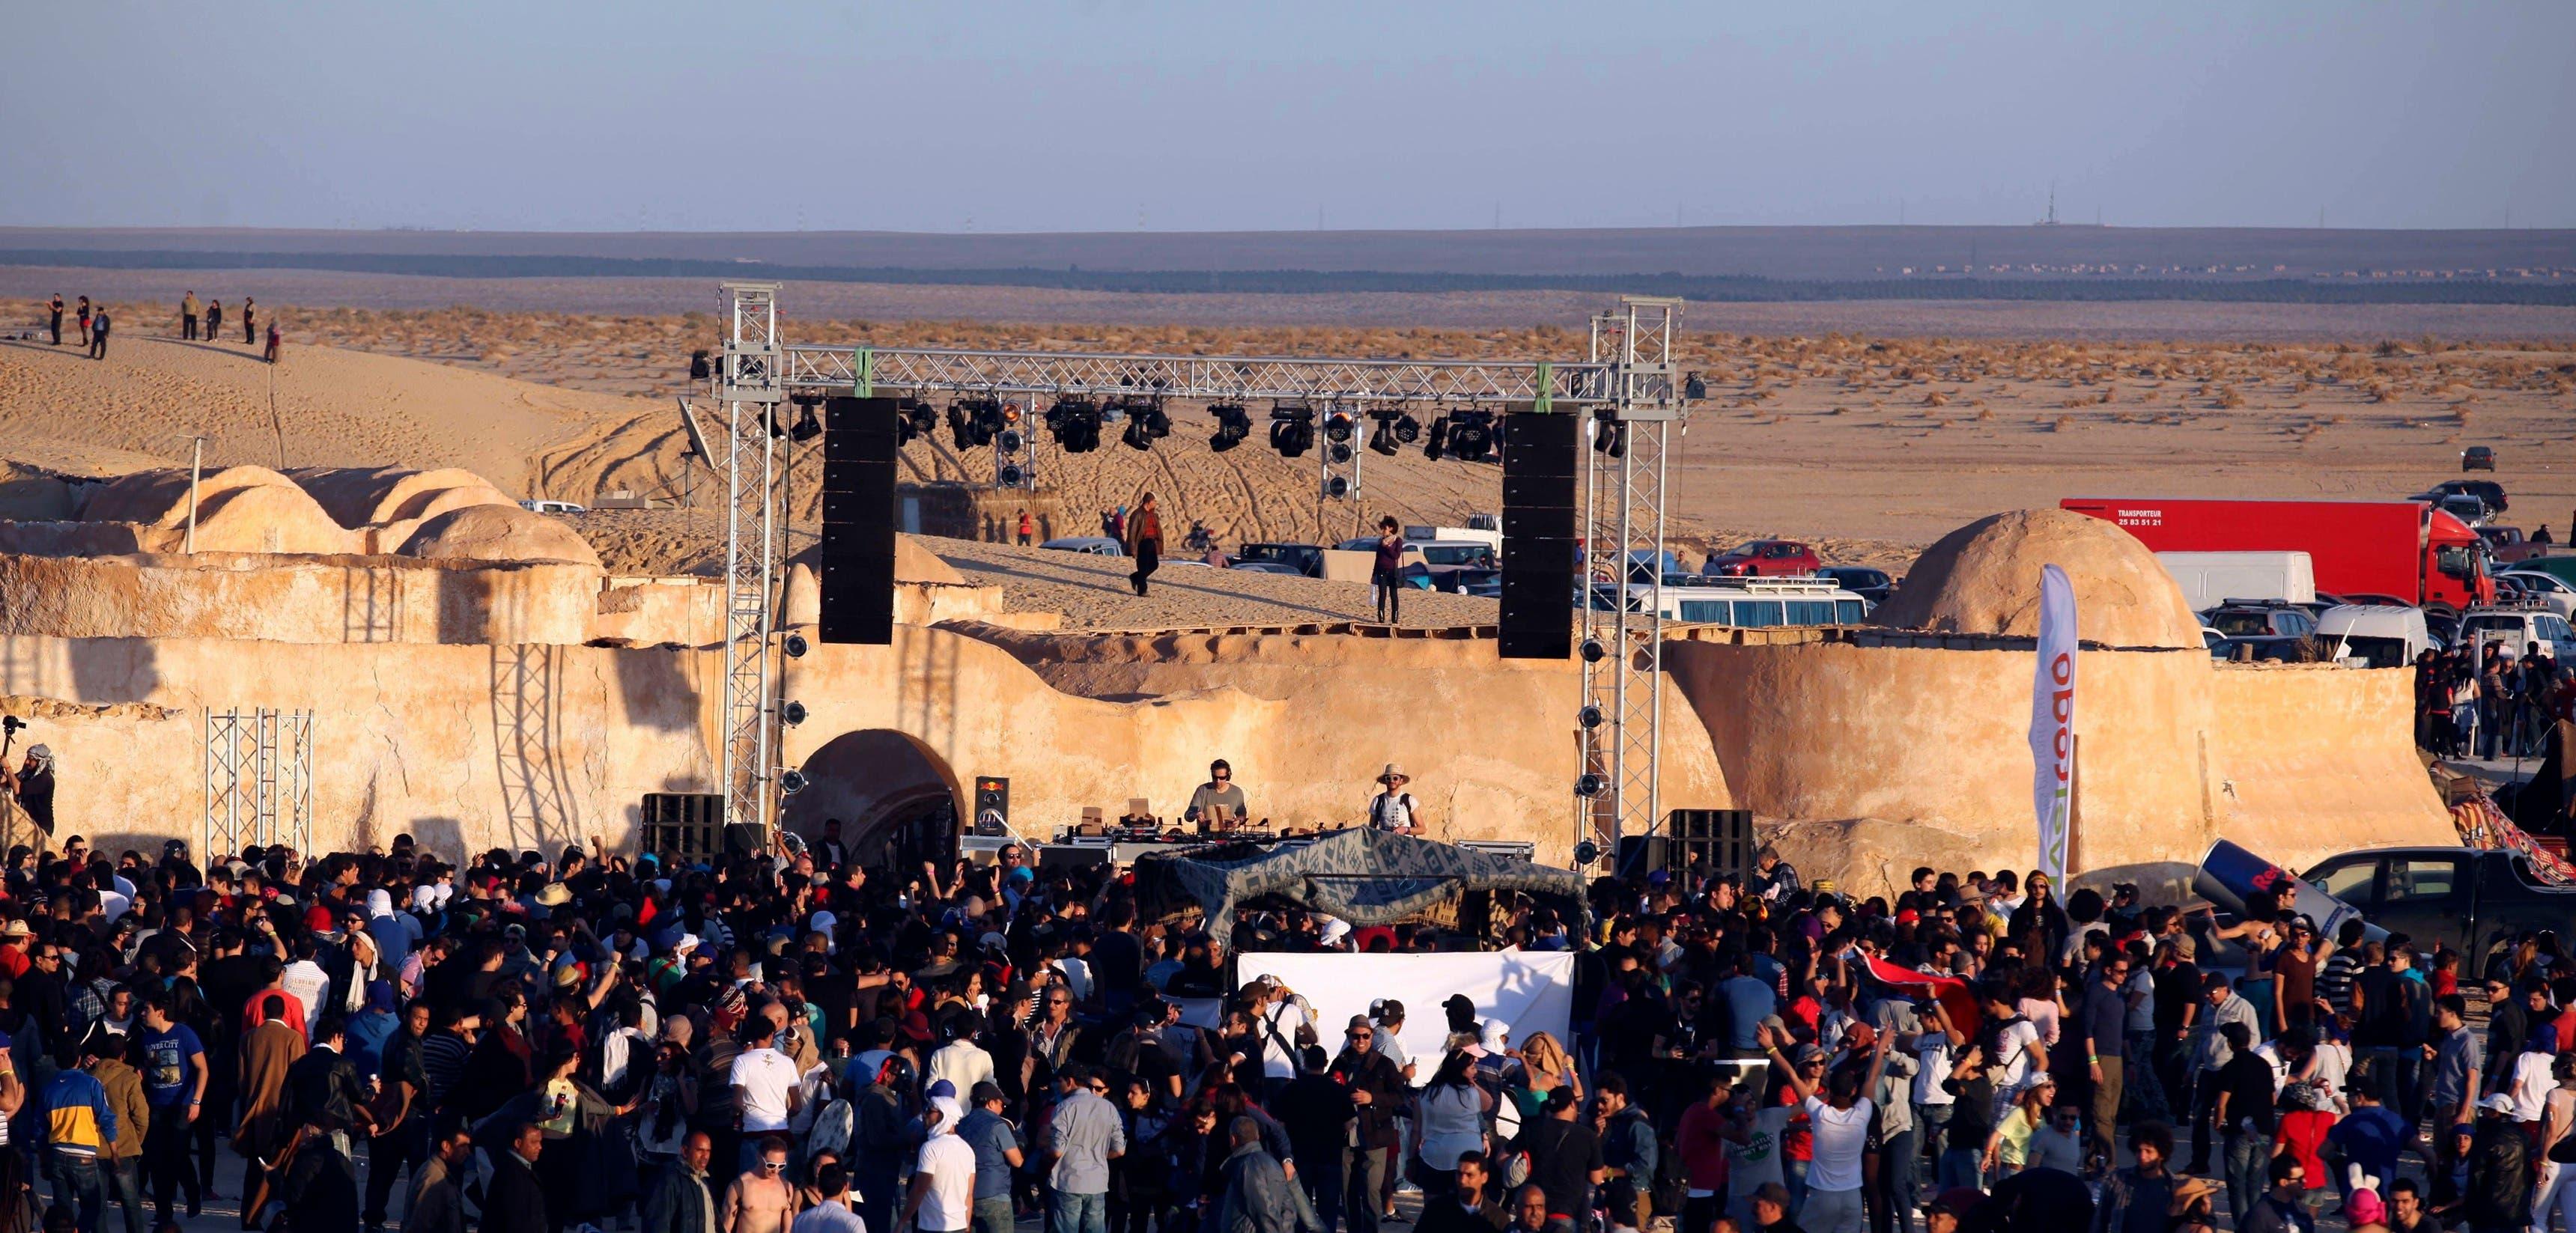 Tunisia's Electronic Music Festival